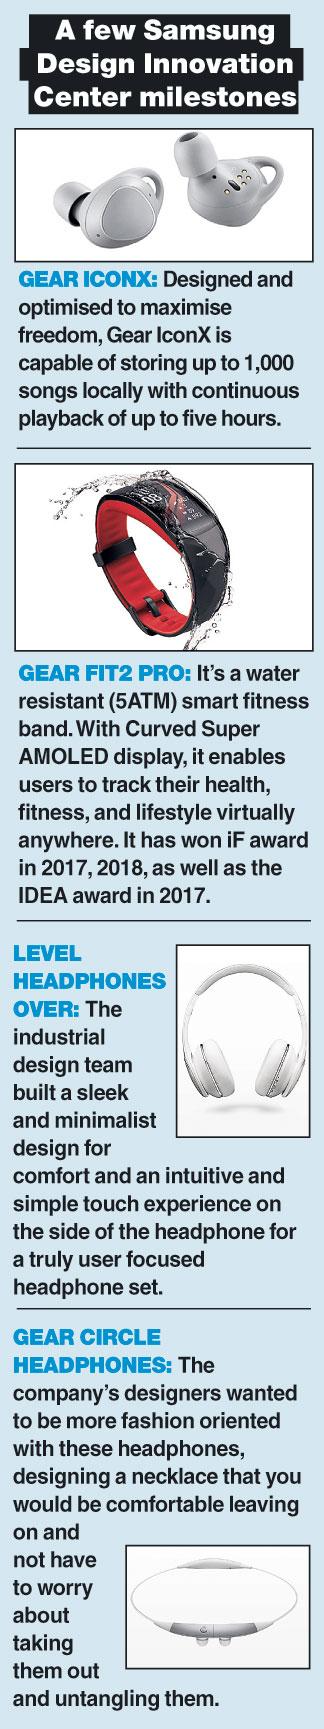 A few Samsung Design Innovation Center milestones